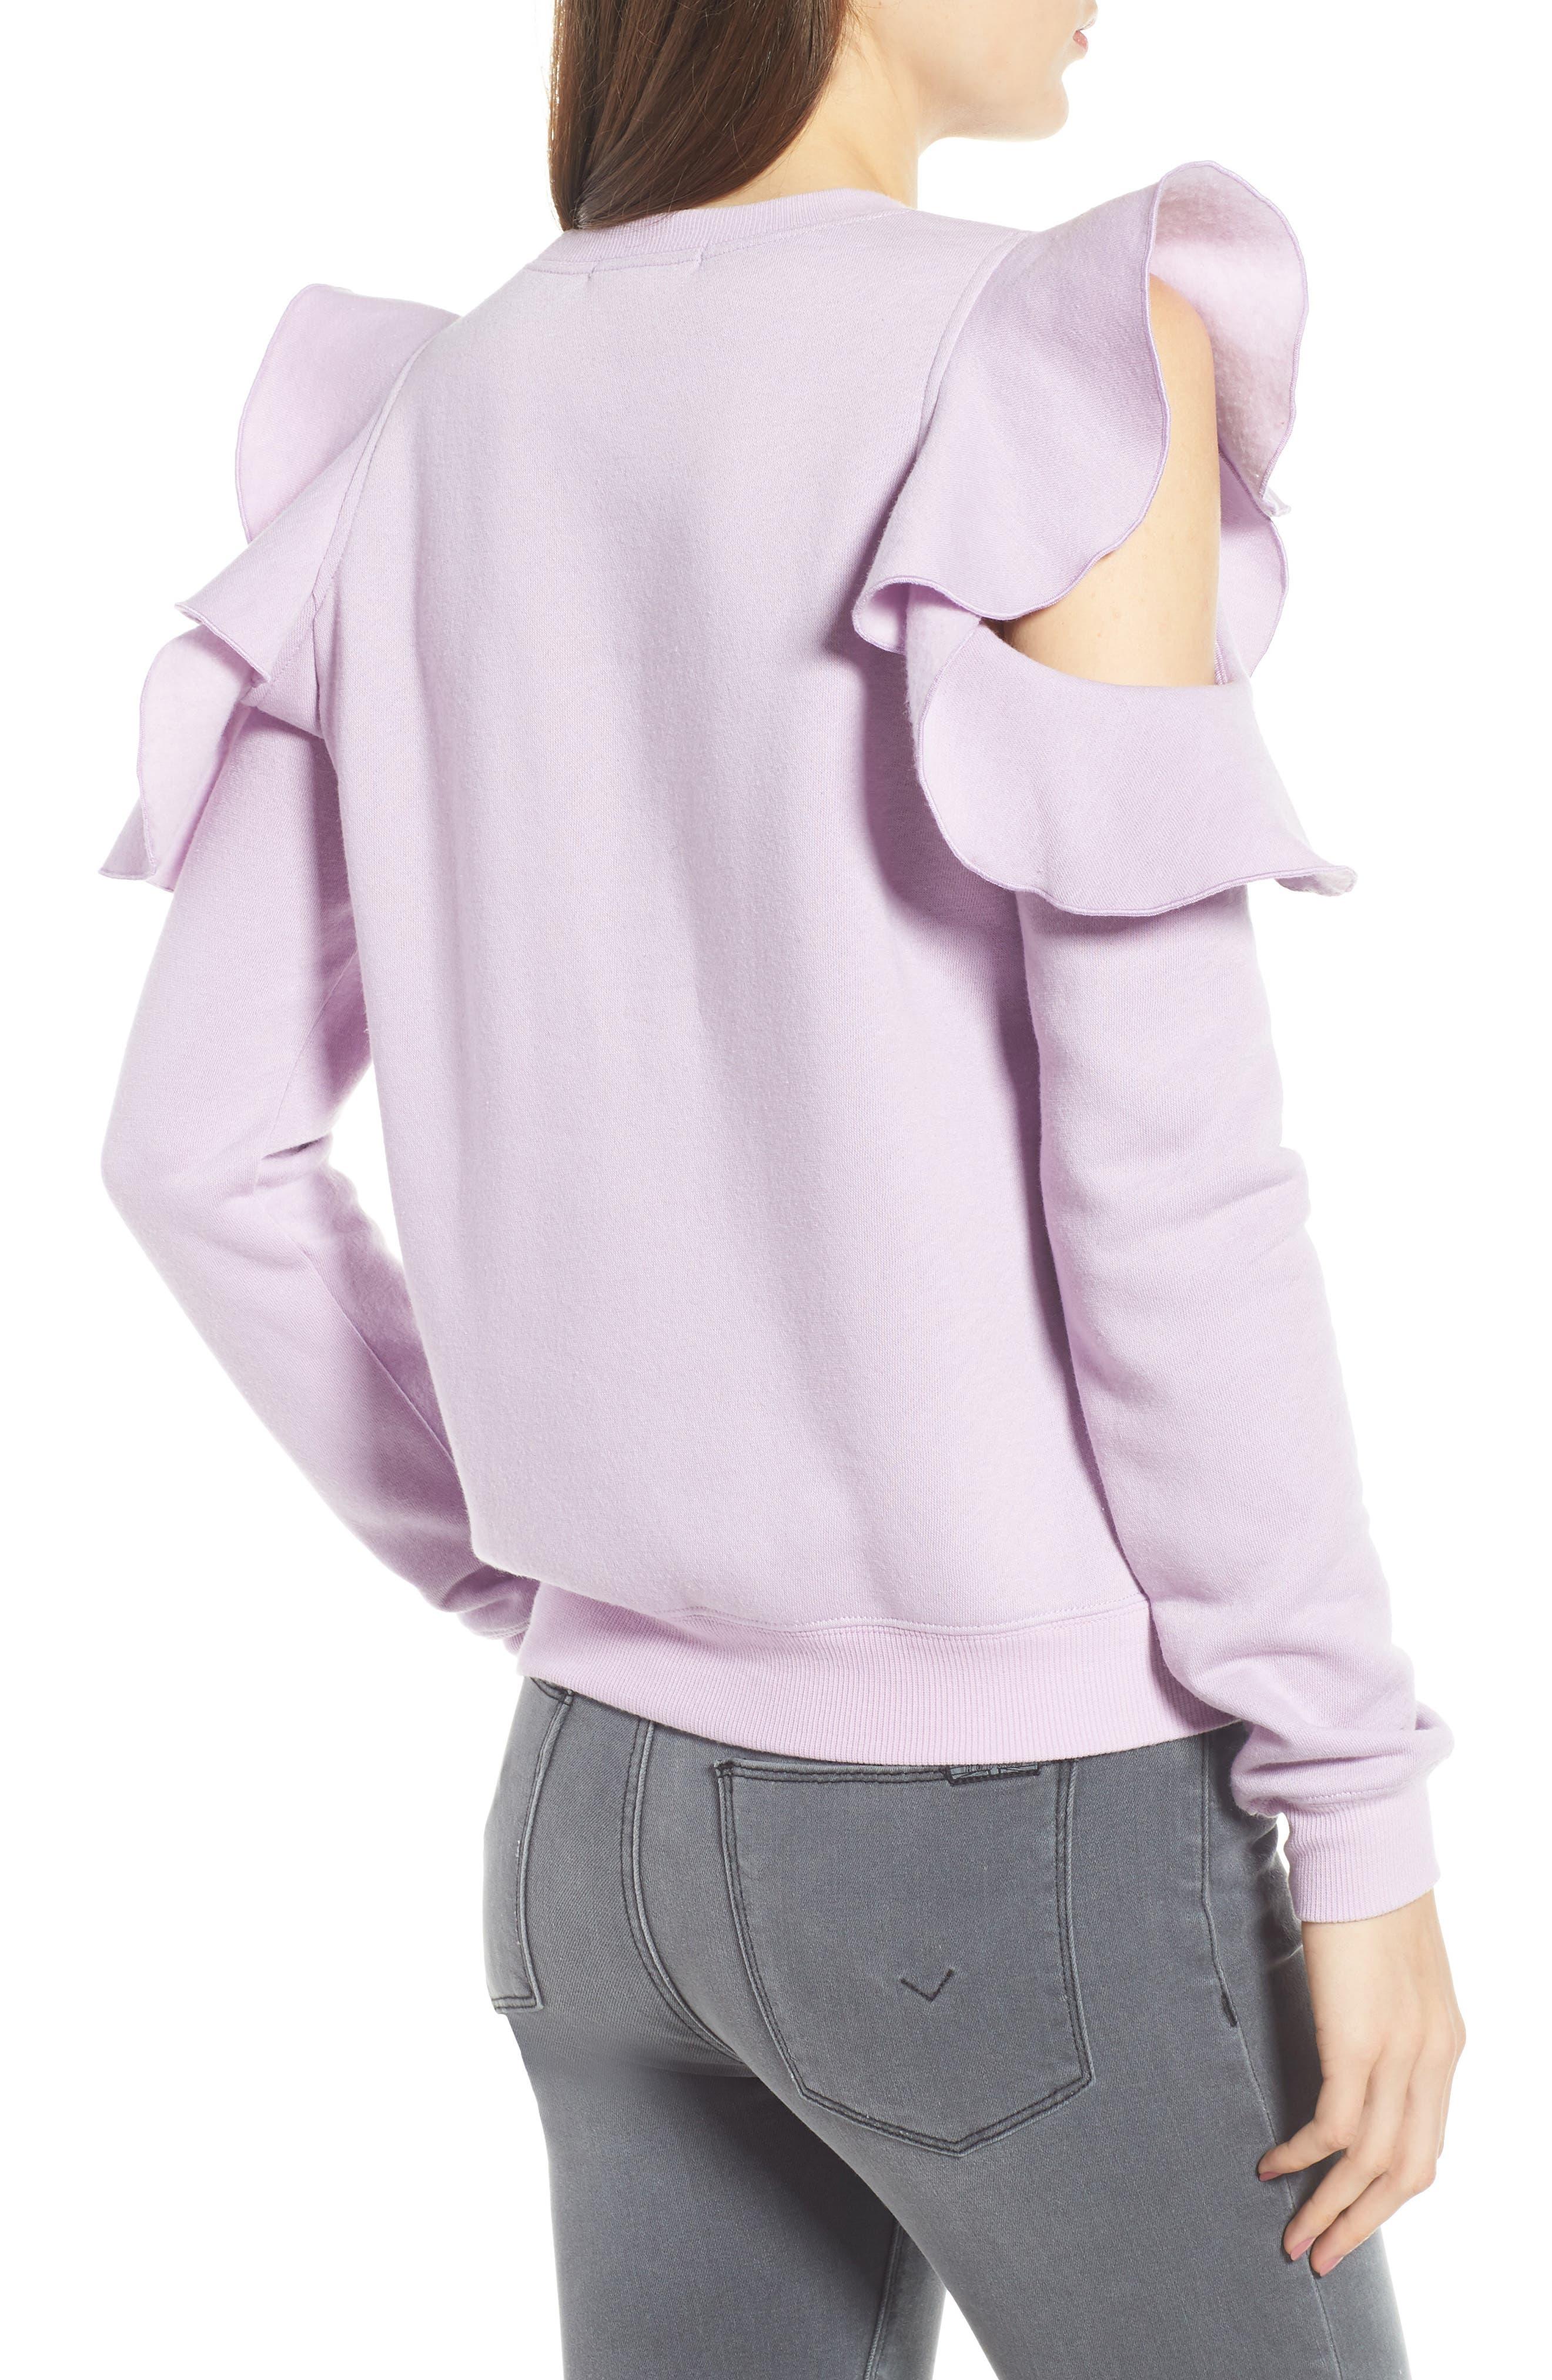 REBECCA MINKOFF, Gracie Cold Shoulder Sweatshirt, Alternate thumbnail 2, color, 502